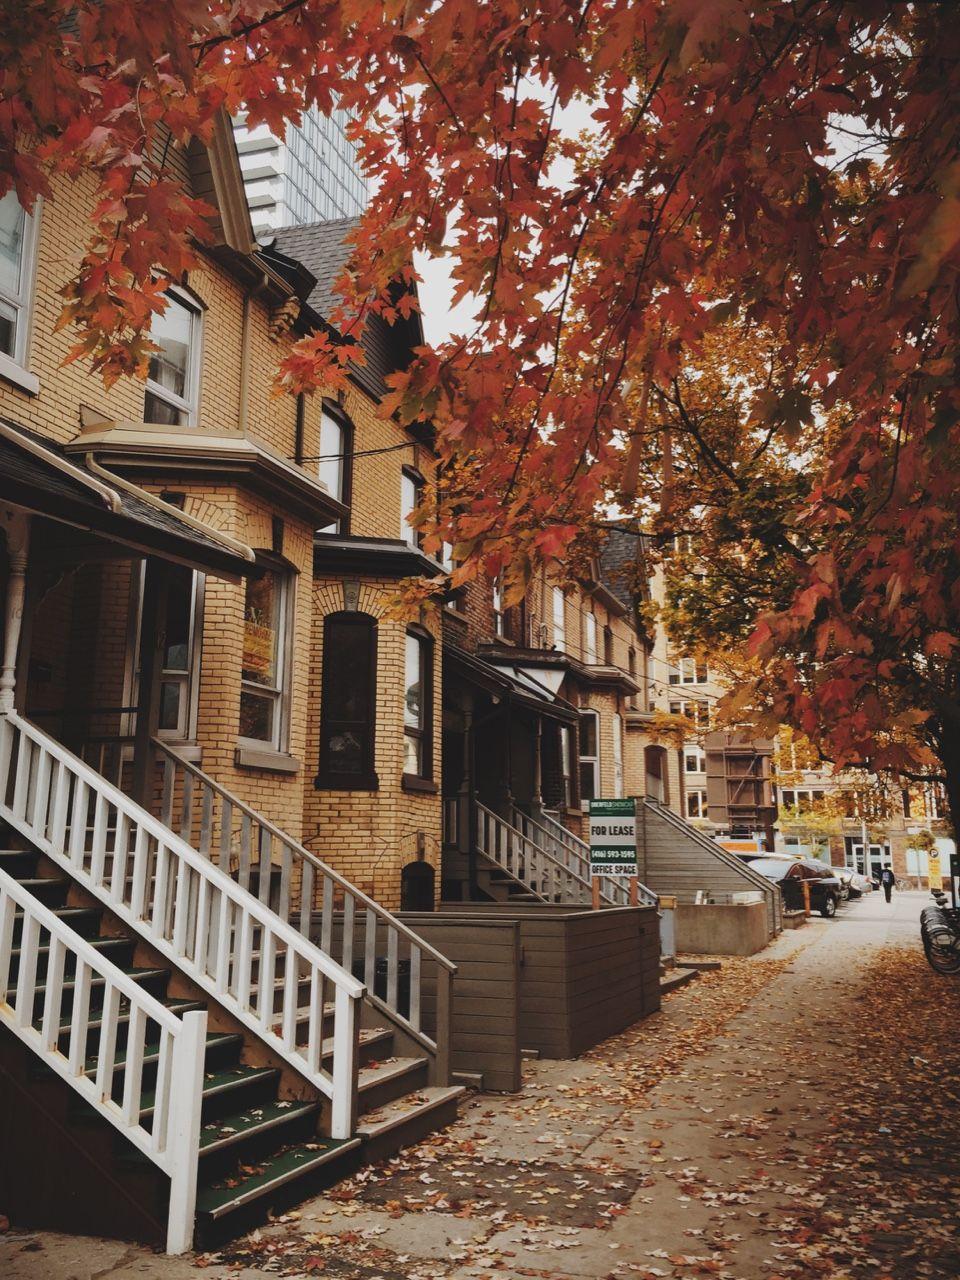 Aesthetic Fall Wallpaper Tumblr